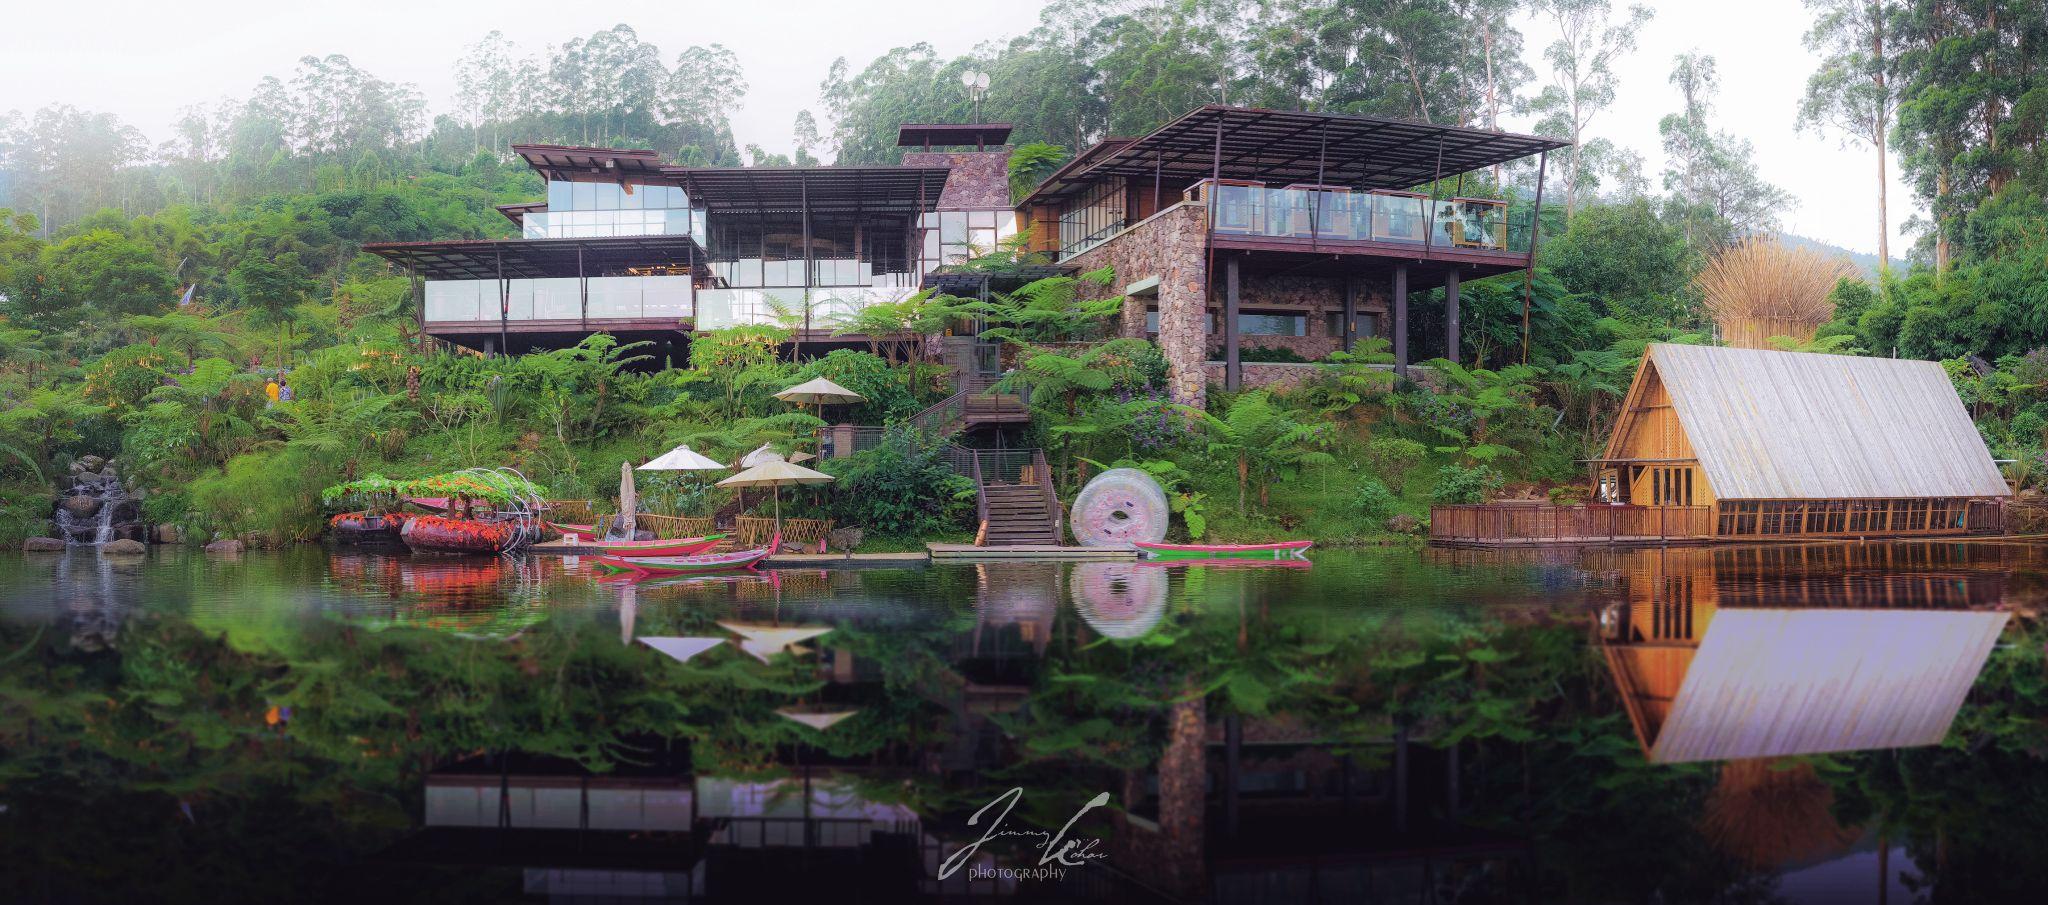 Dusun Bambu, Indonesia